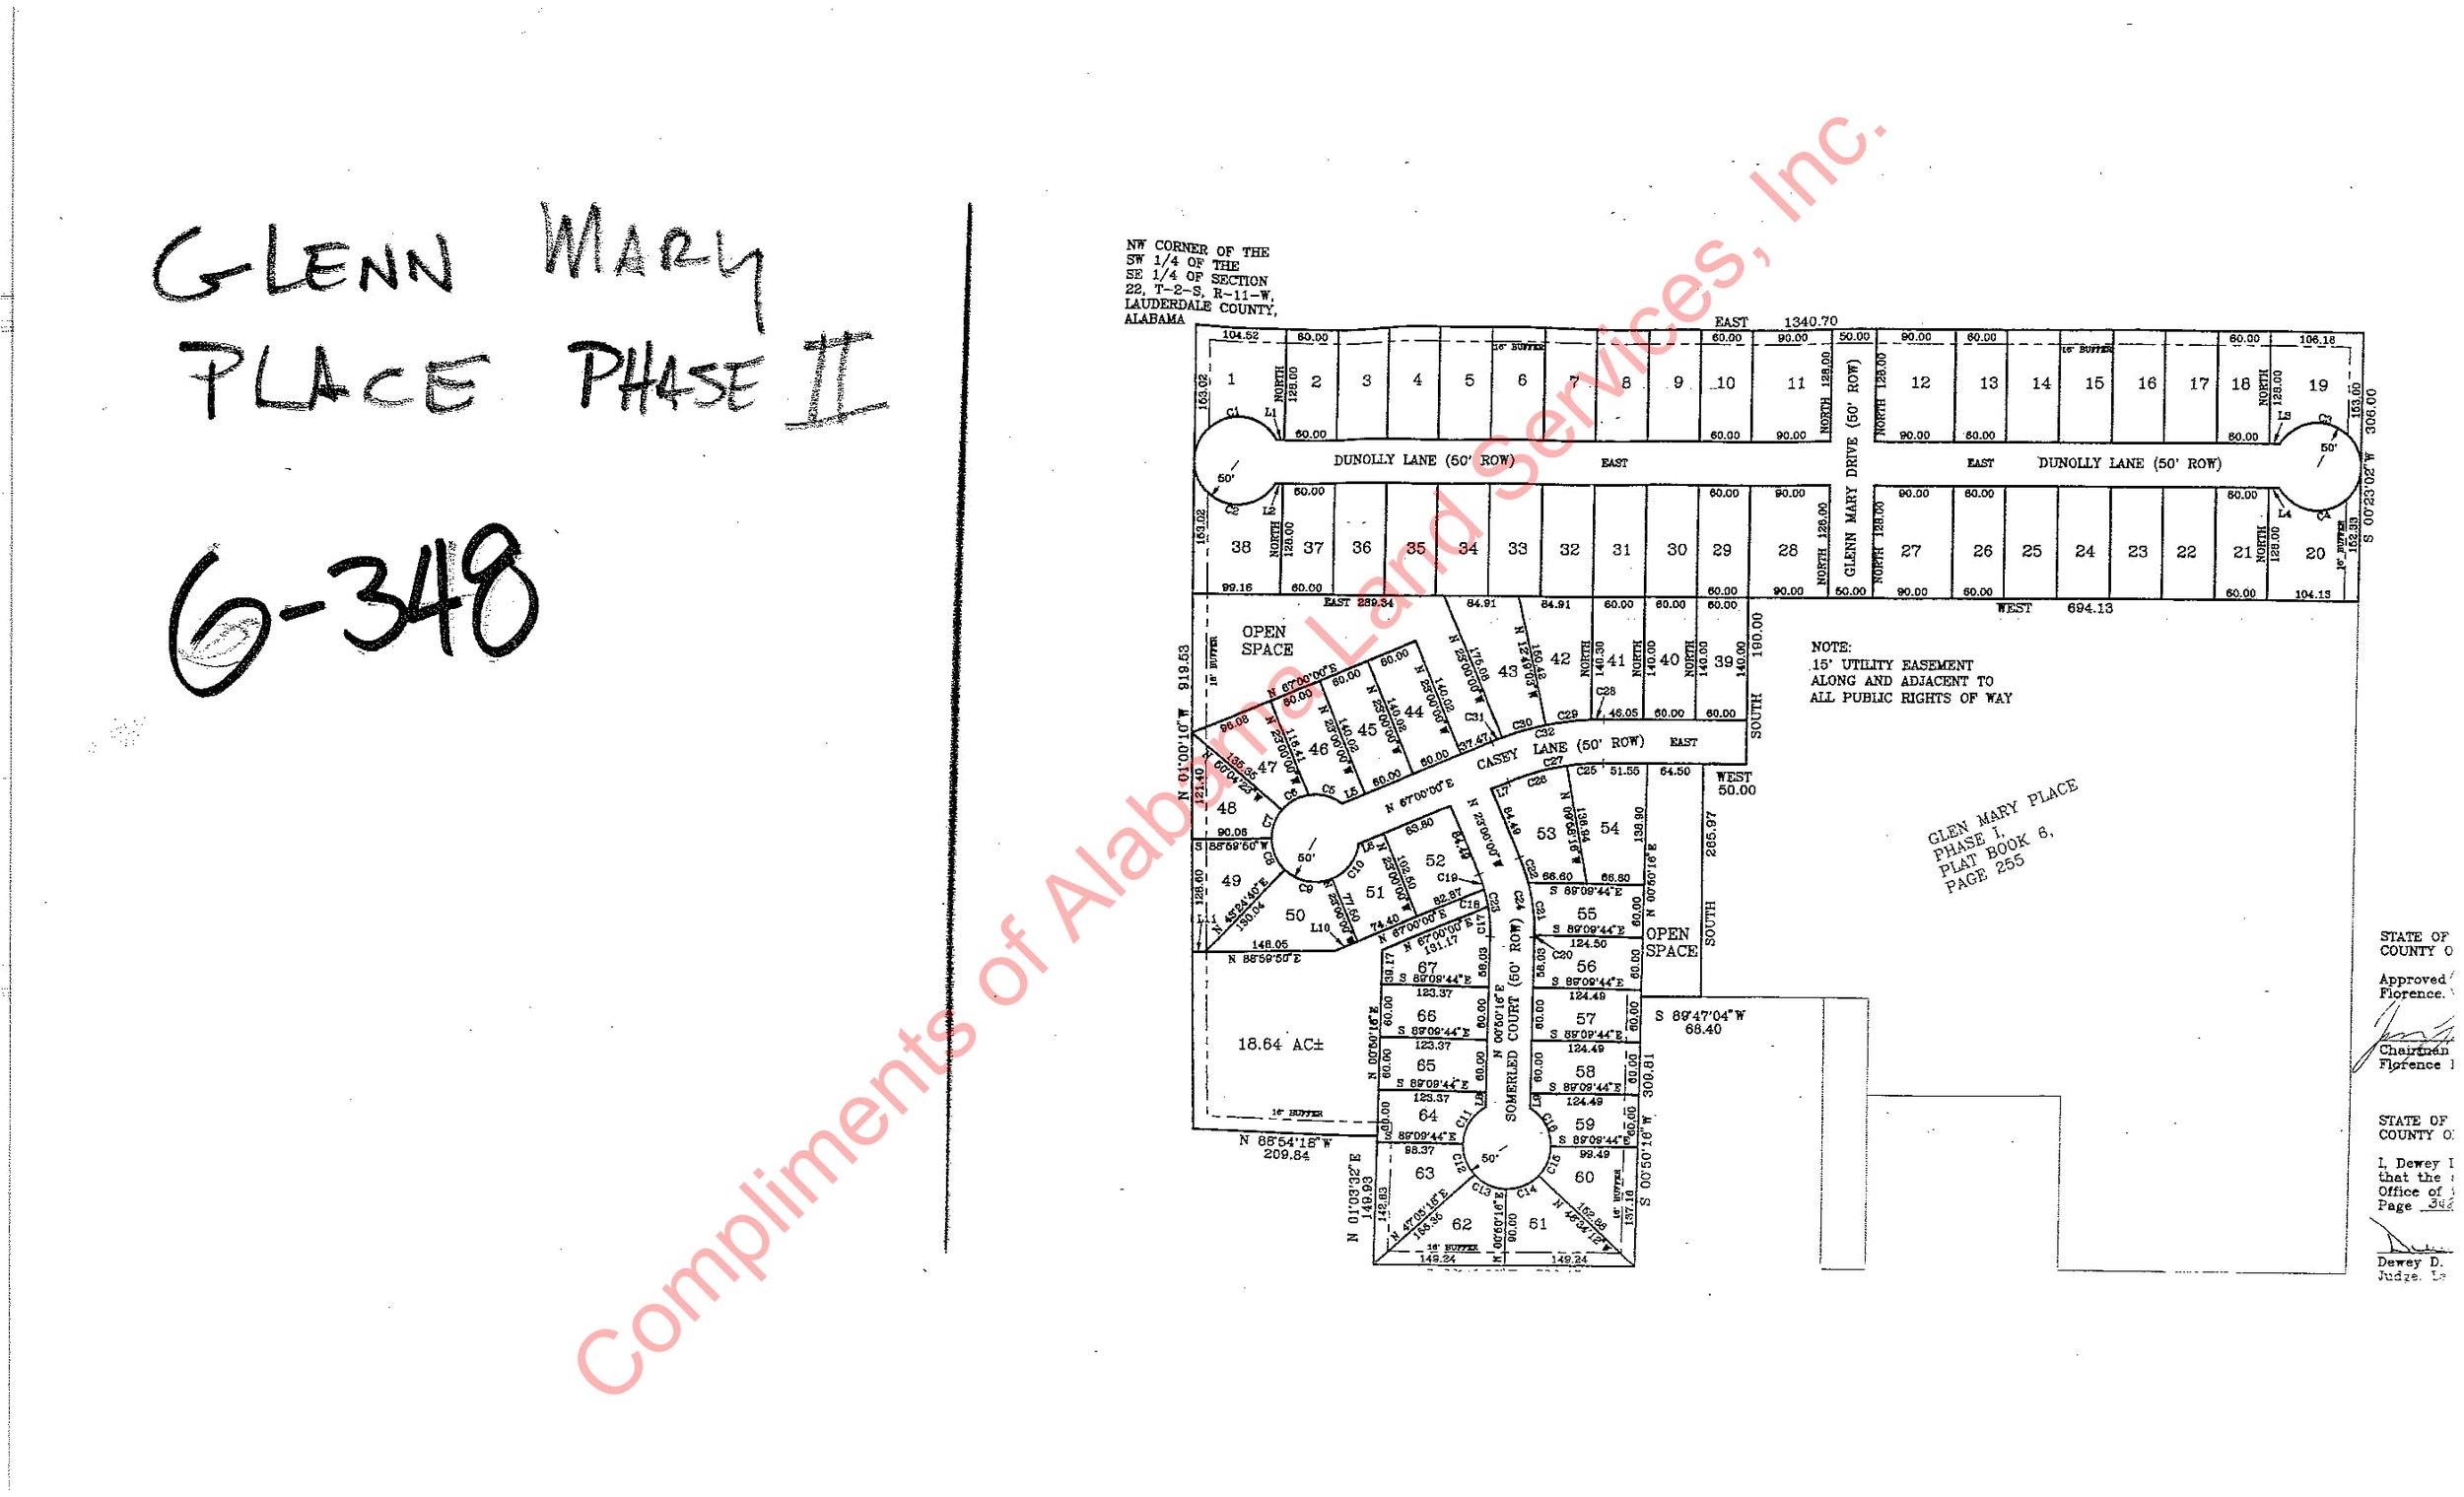 Glenn Mary Place Phase II plat-1.jpg